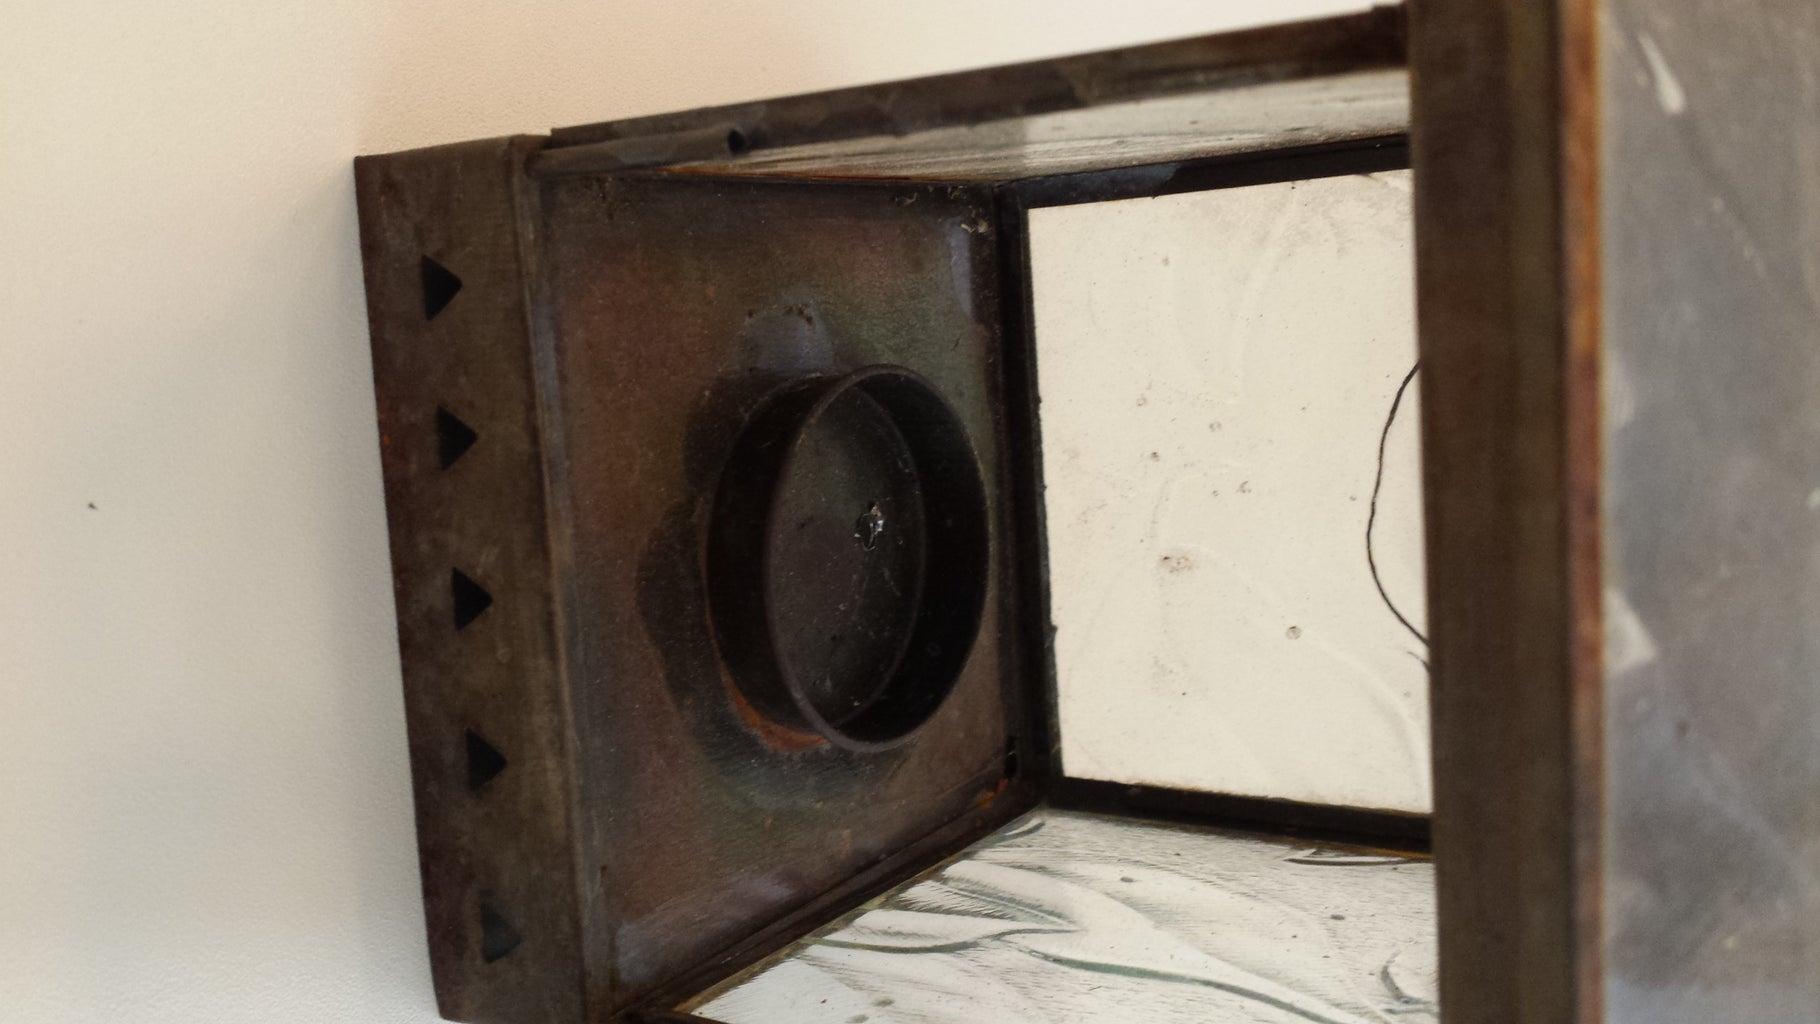 Prepare the Lantern for the Modified Electronics.